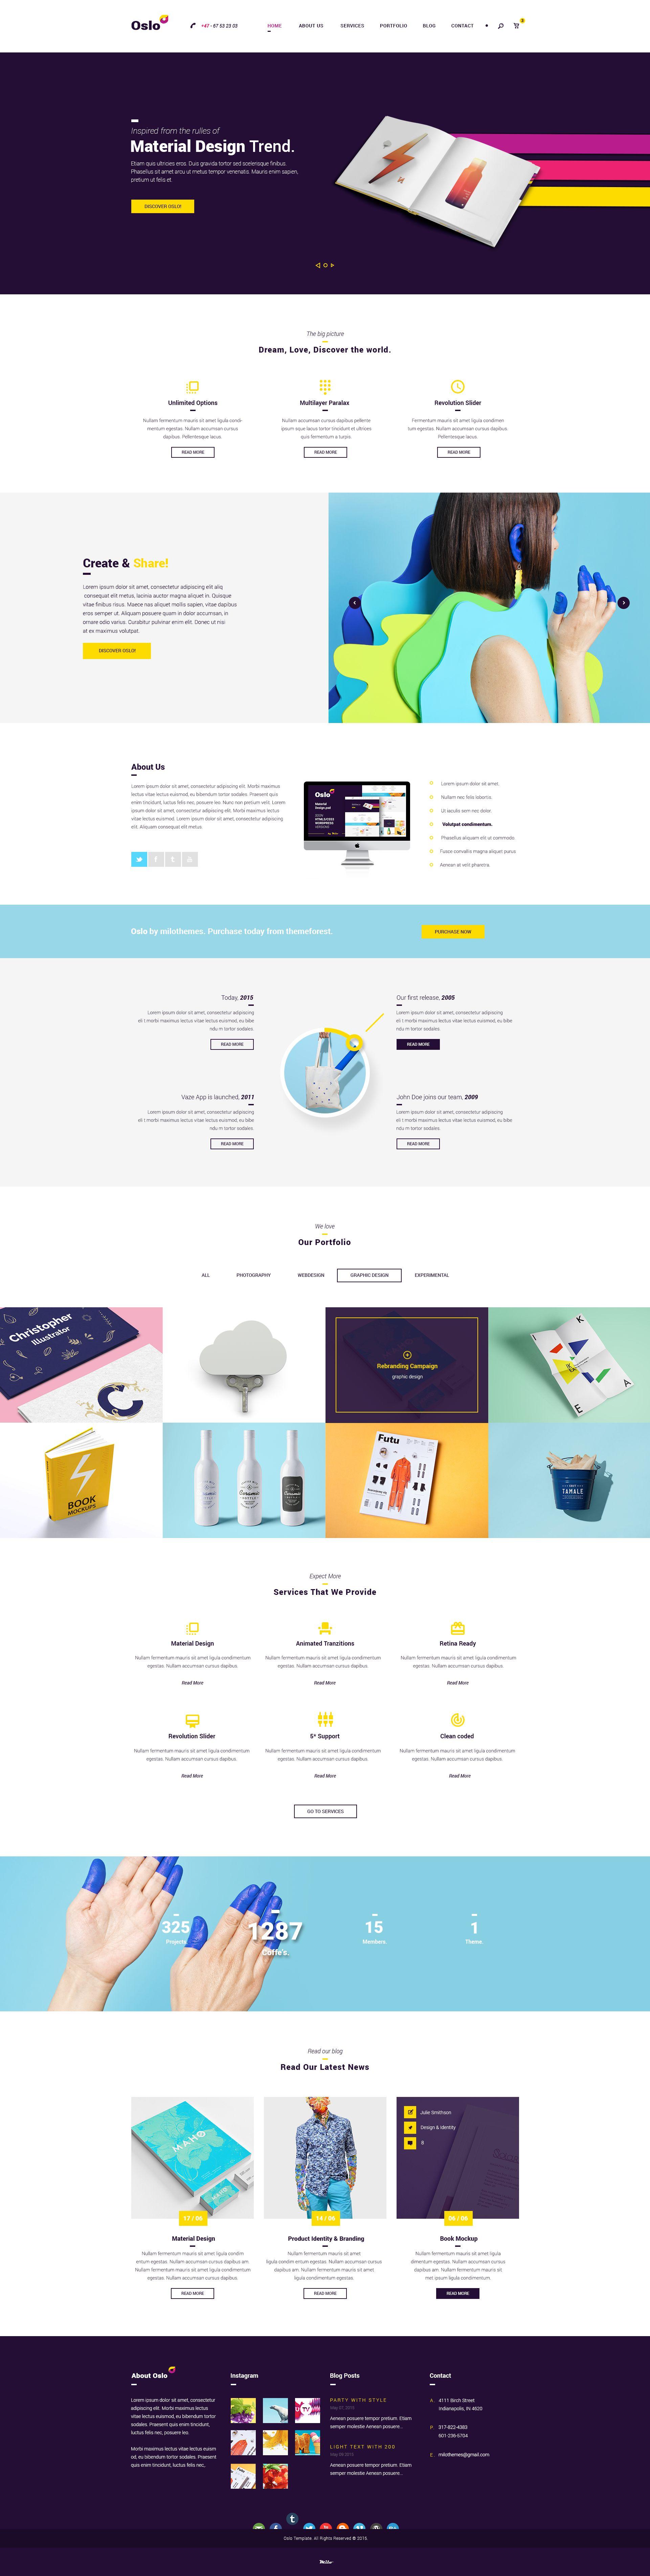 Material design psd